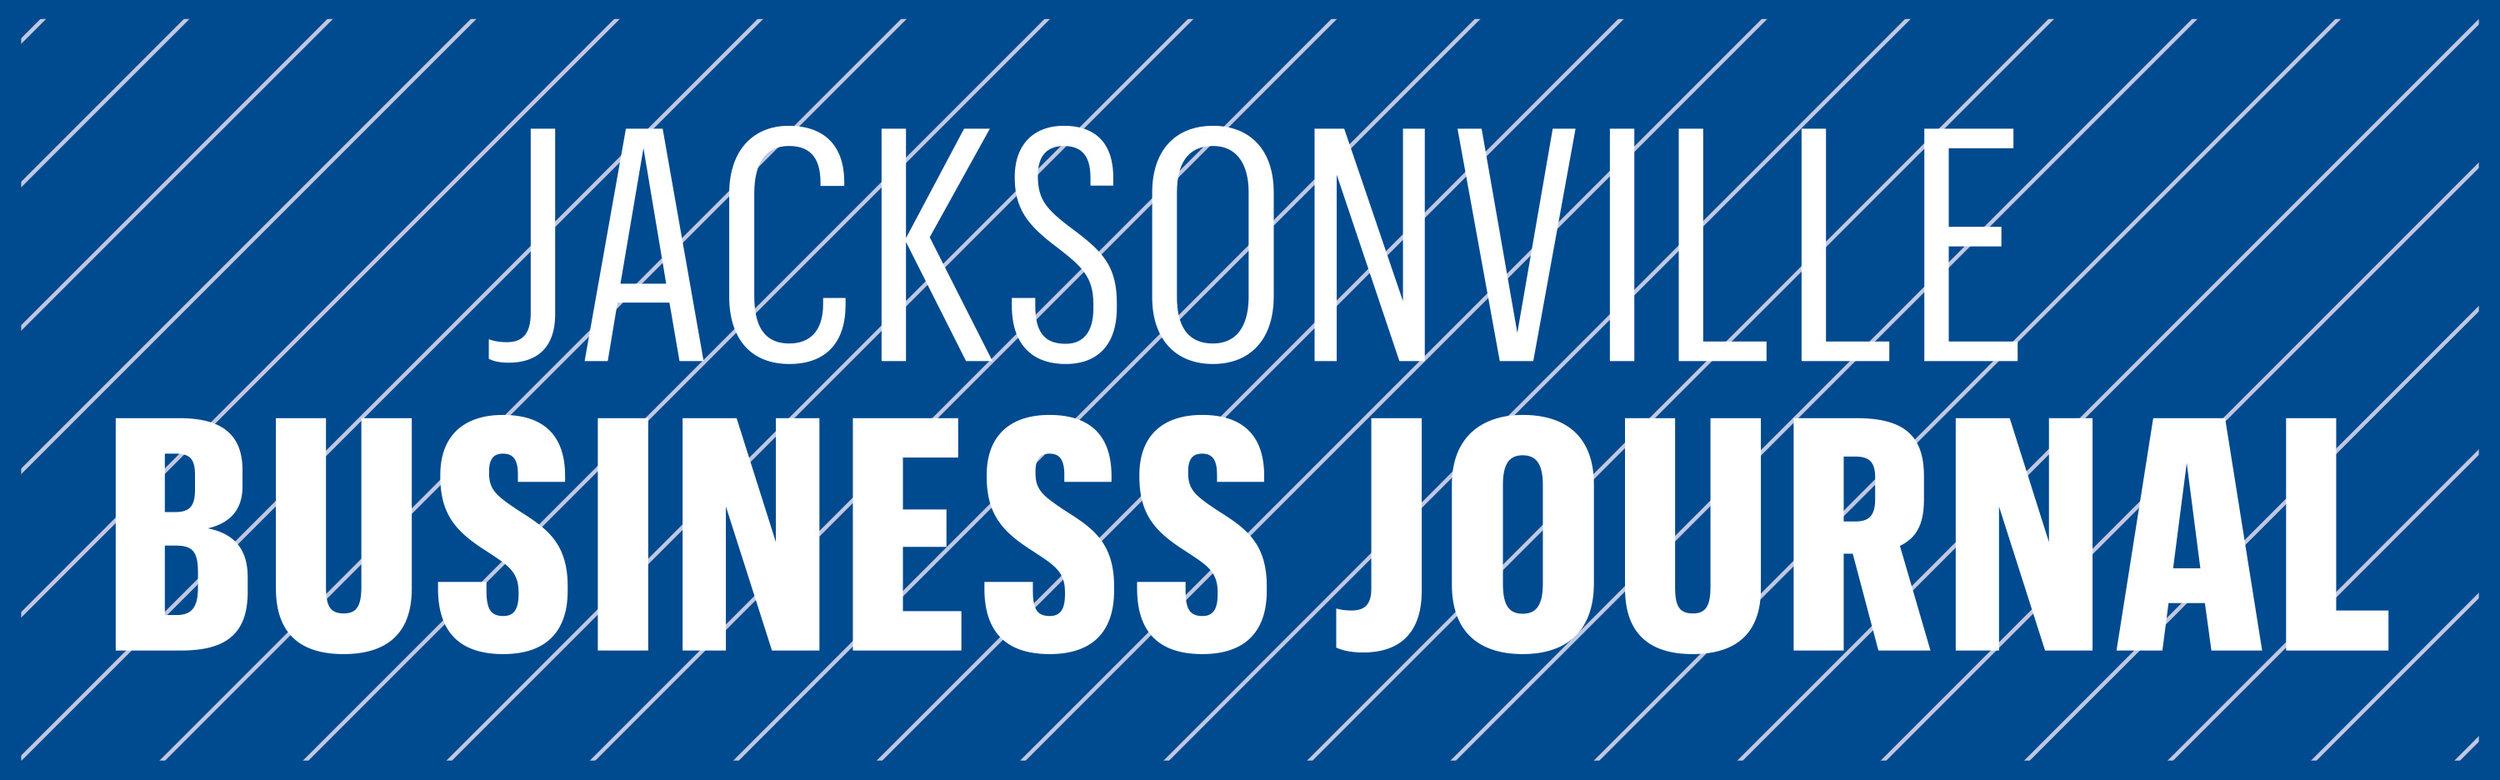 jbj-logo-nameplatelarge.jpg